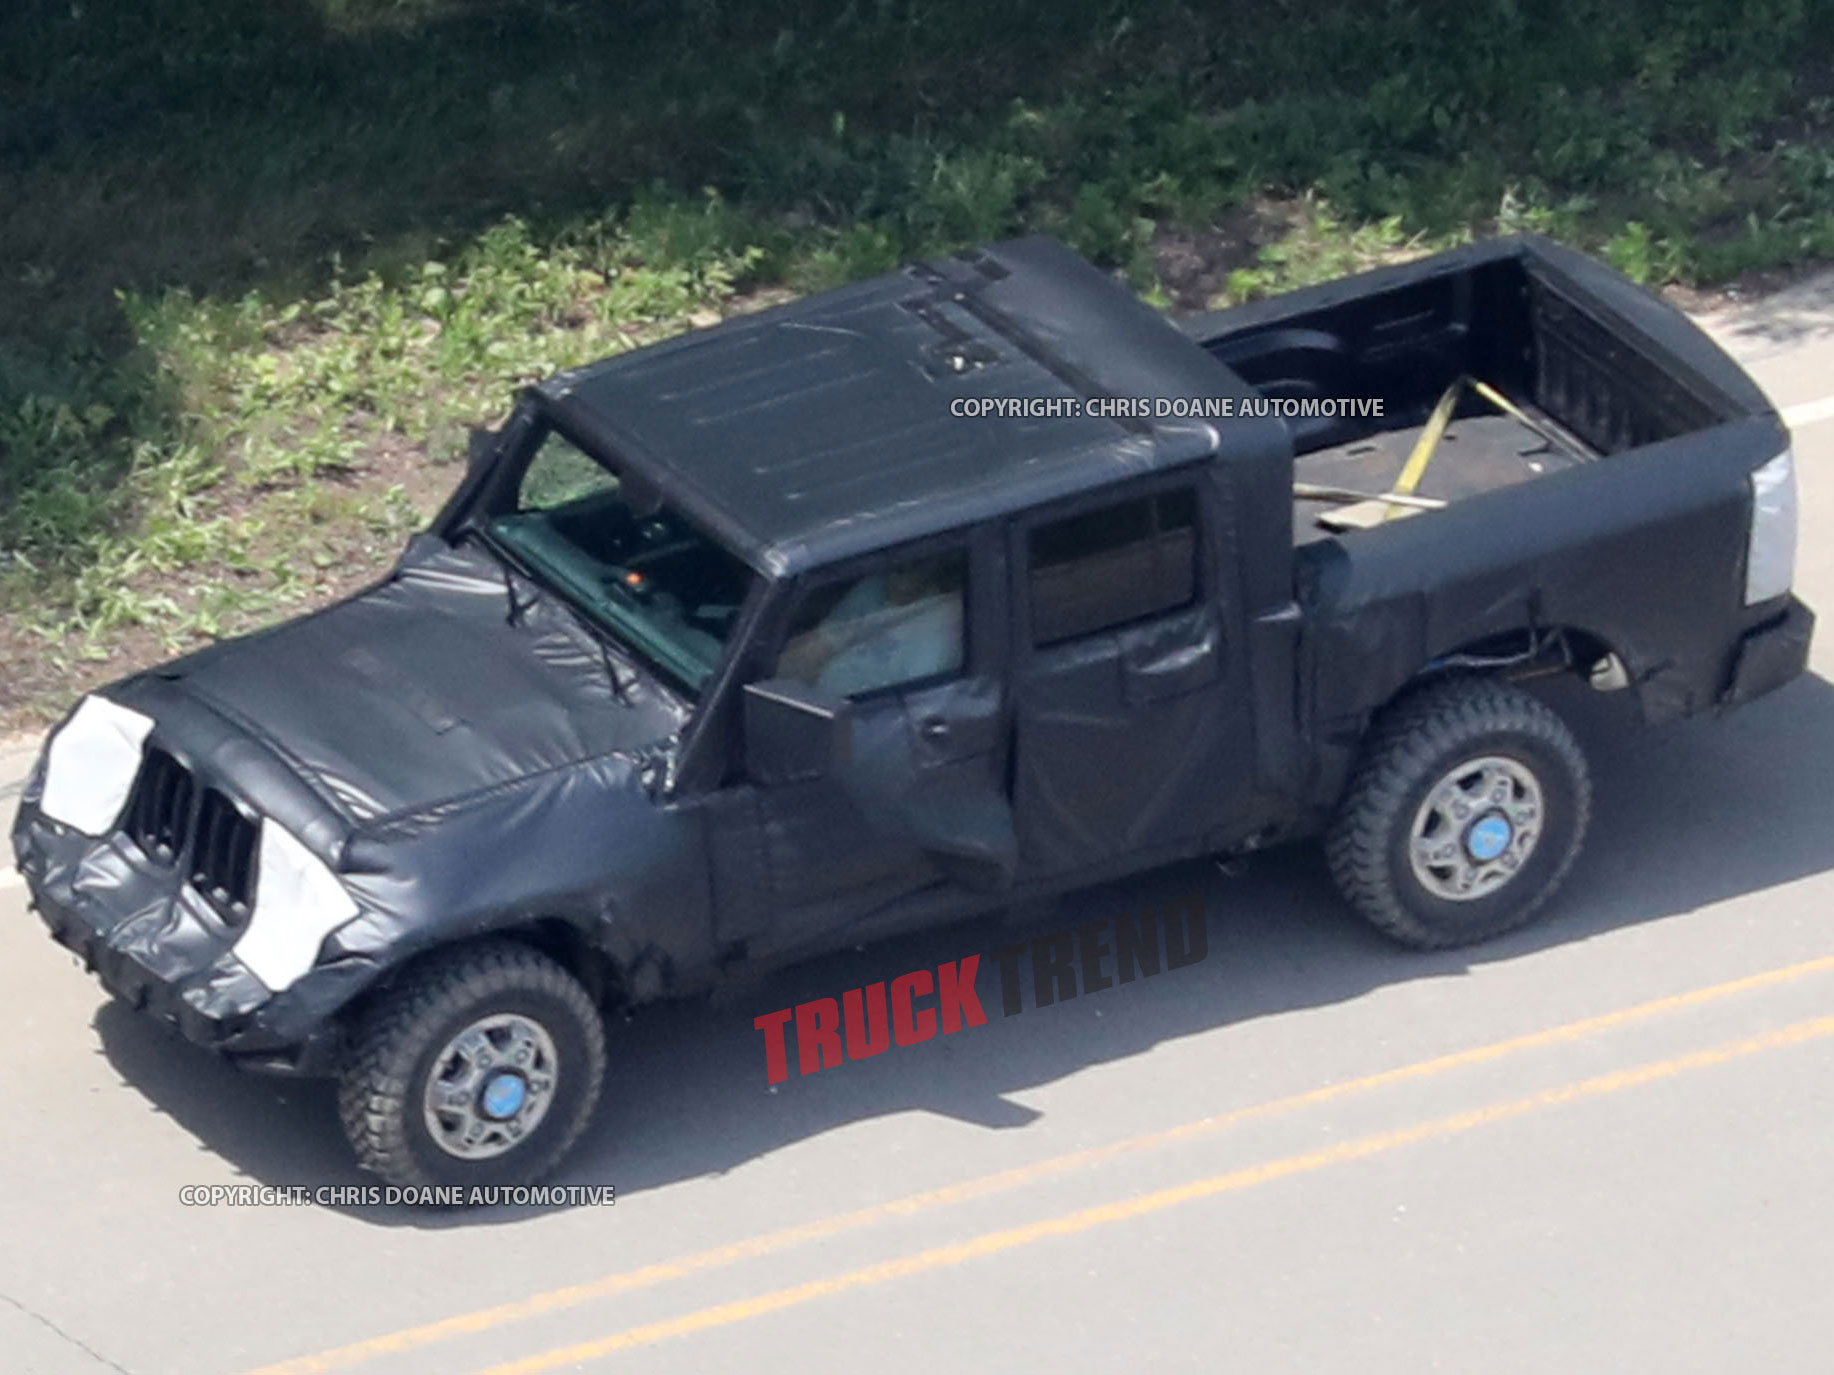 2019 Jeep Wrangler JL Pickup Spyshots 18